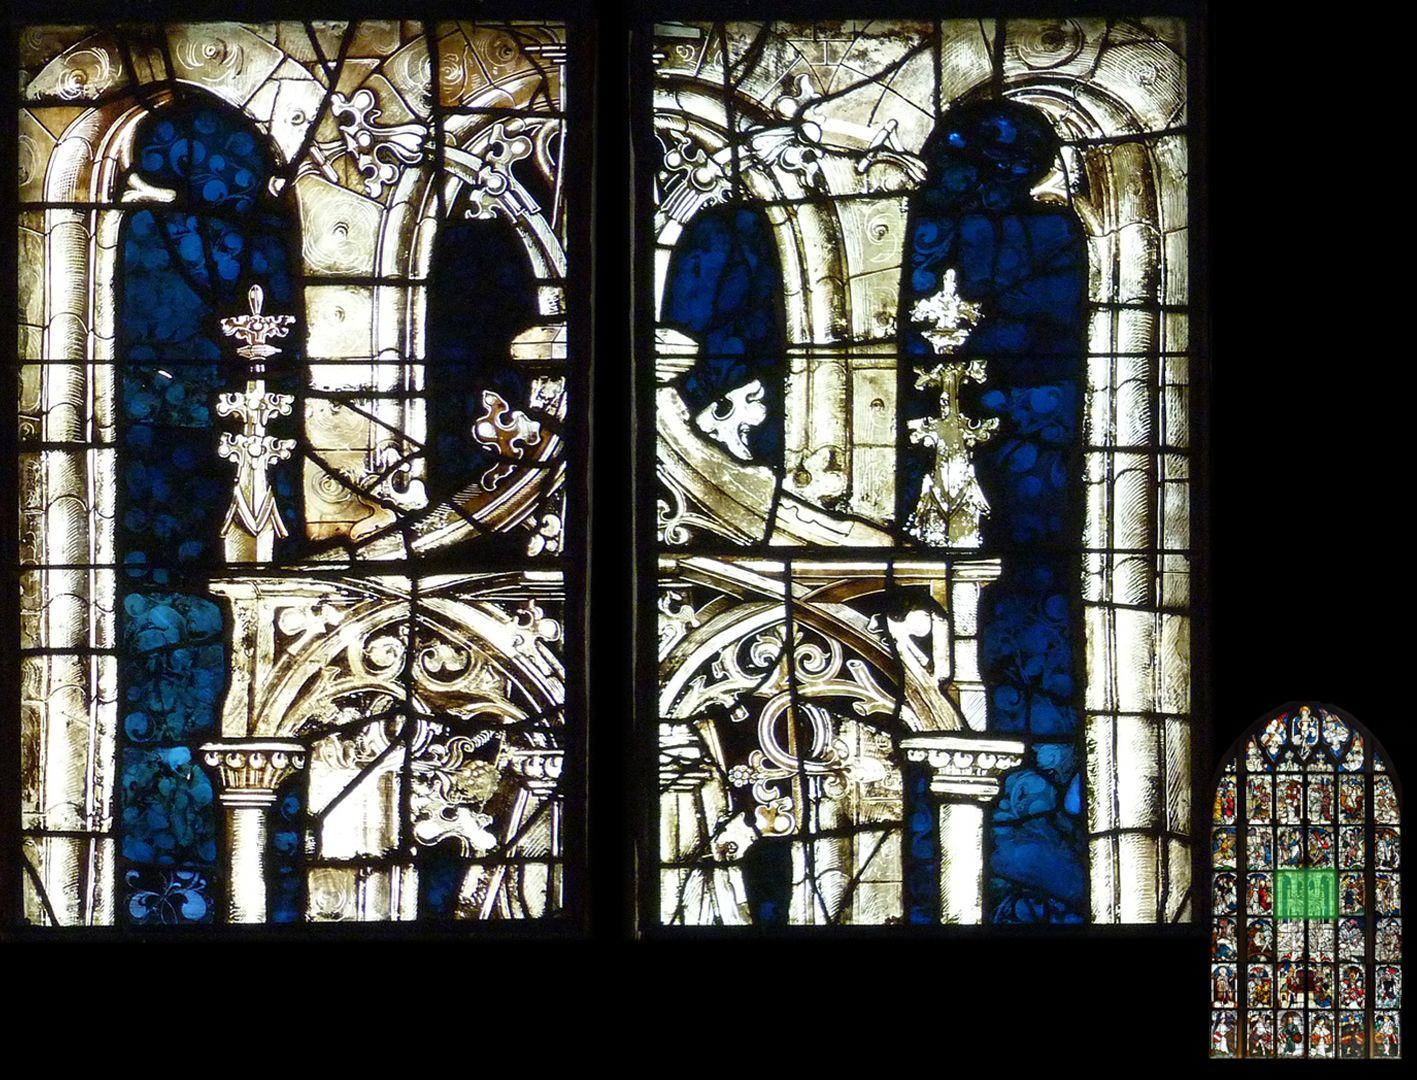 Kaiserfenster oberer Abschluss der Baldachinarchitektur über dem Kaiserpaar